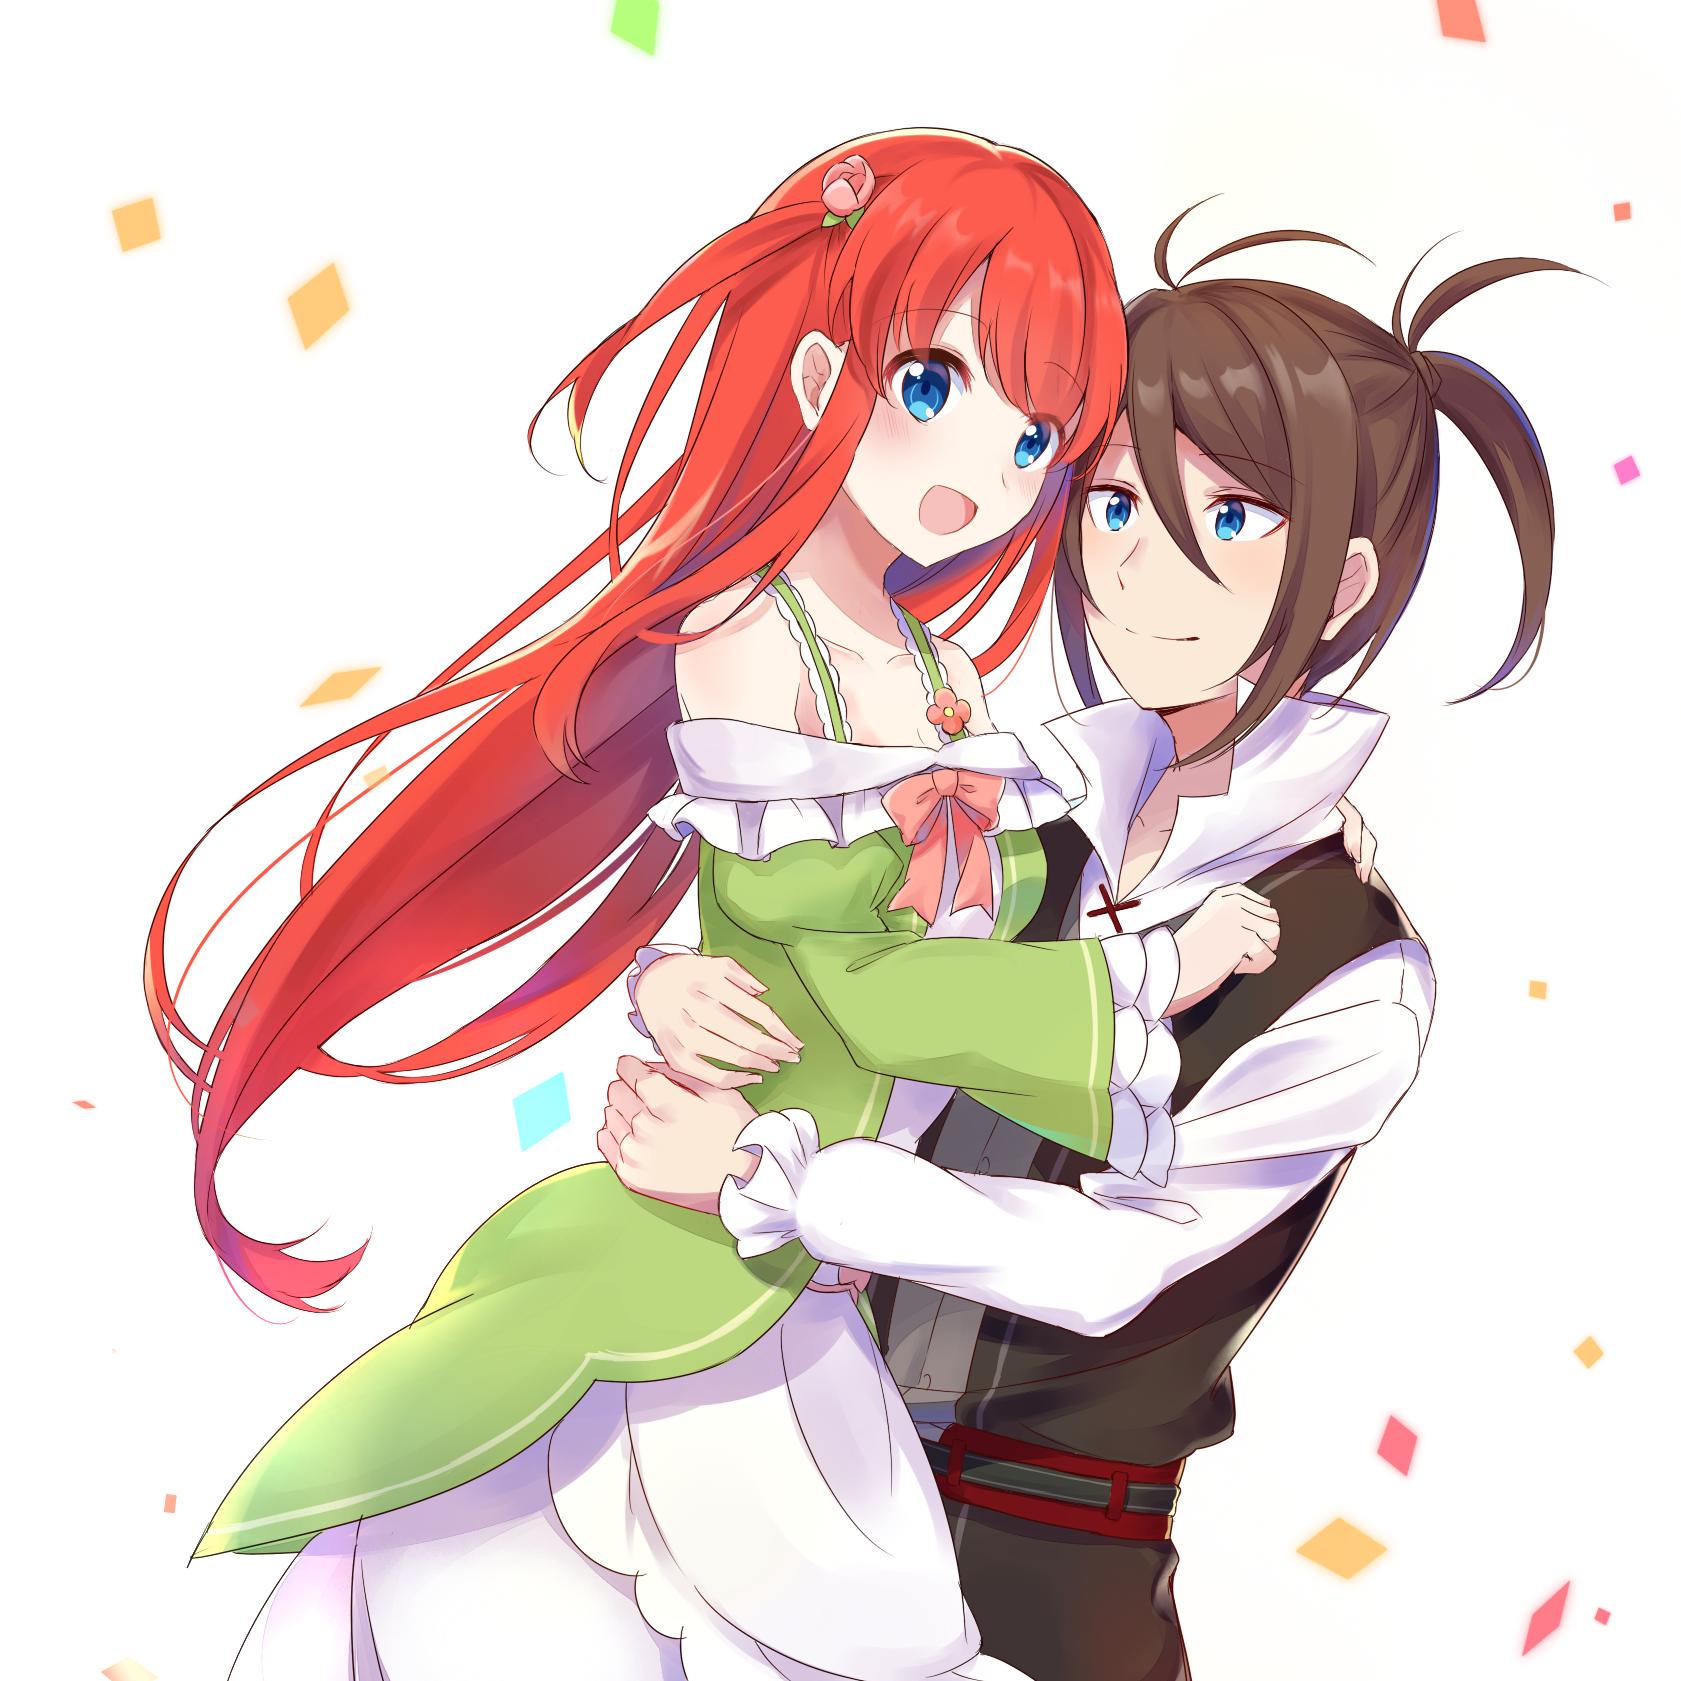 Pin by Veronika Tyan on милости Anime, Anime images